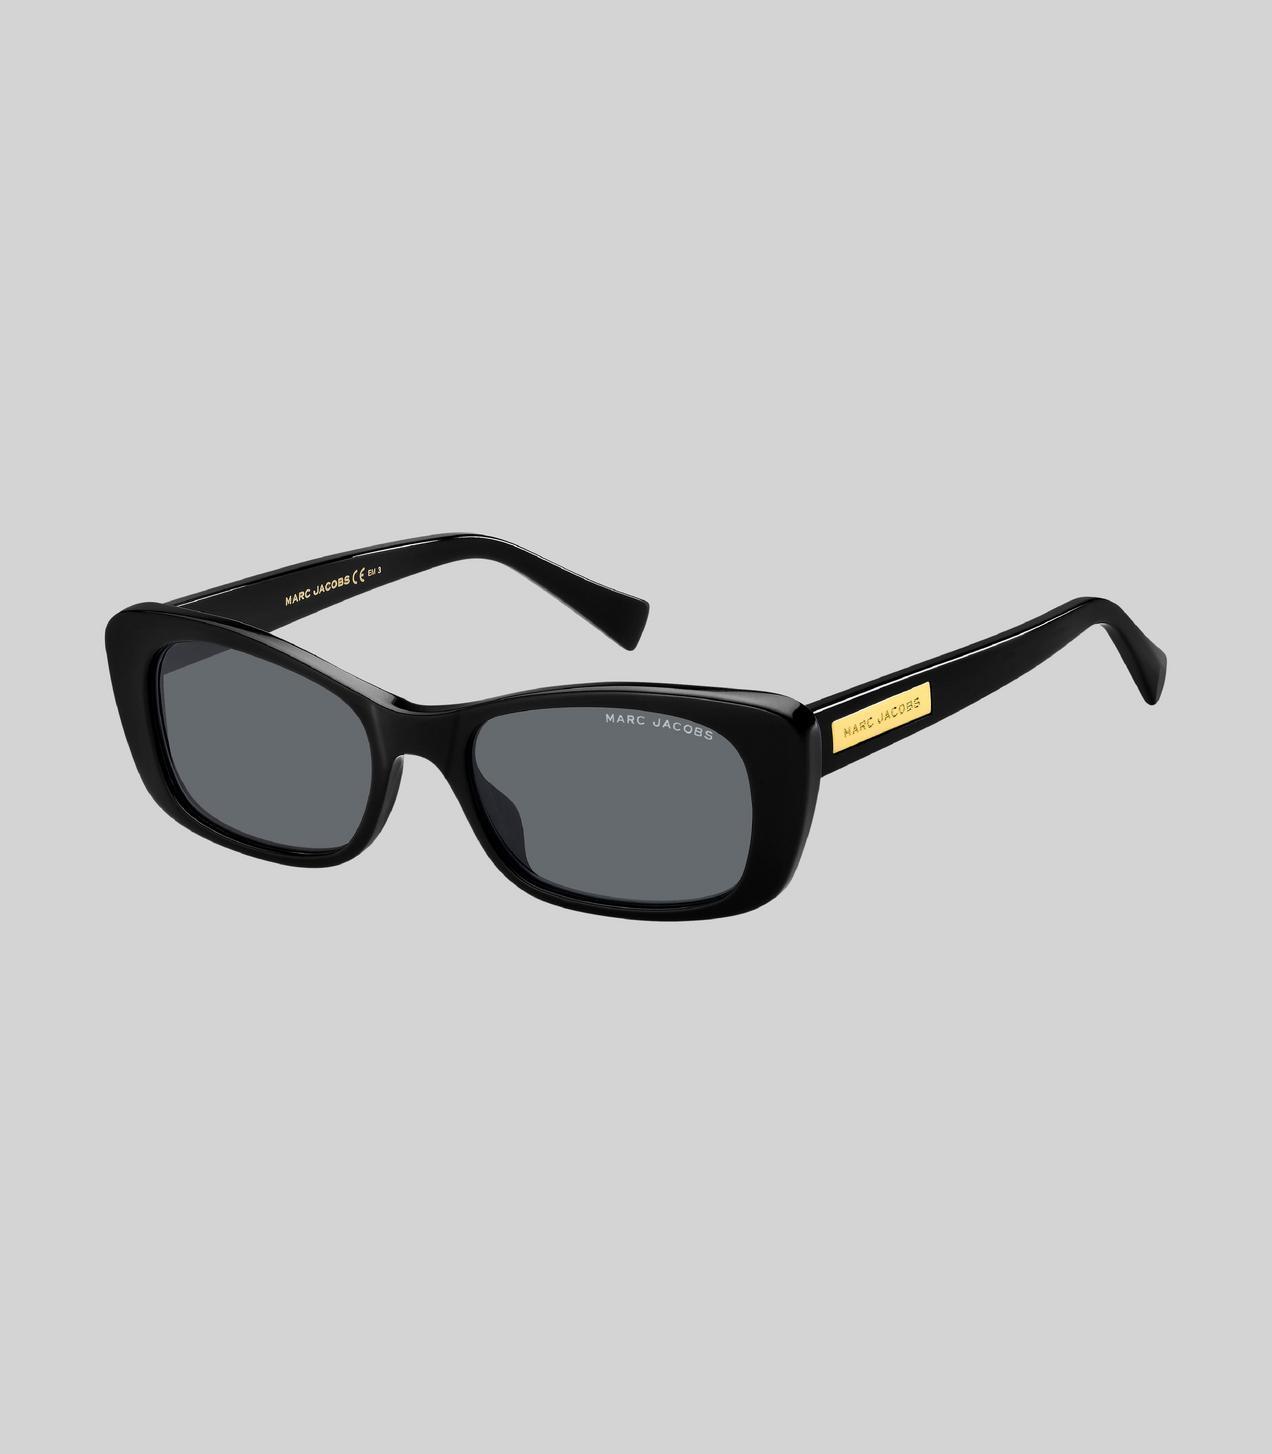 Marc Jacobs墨镜 Signature Plaque Glasses